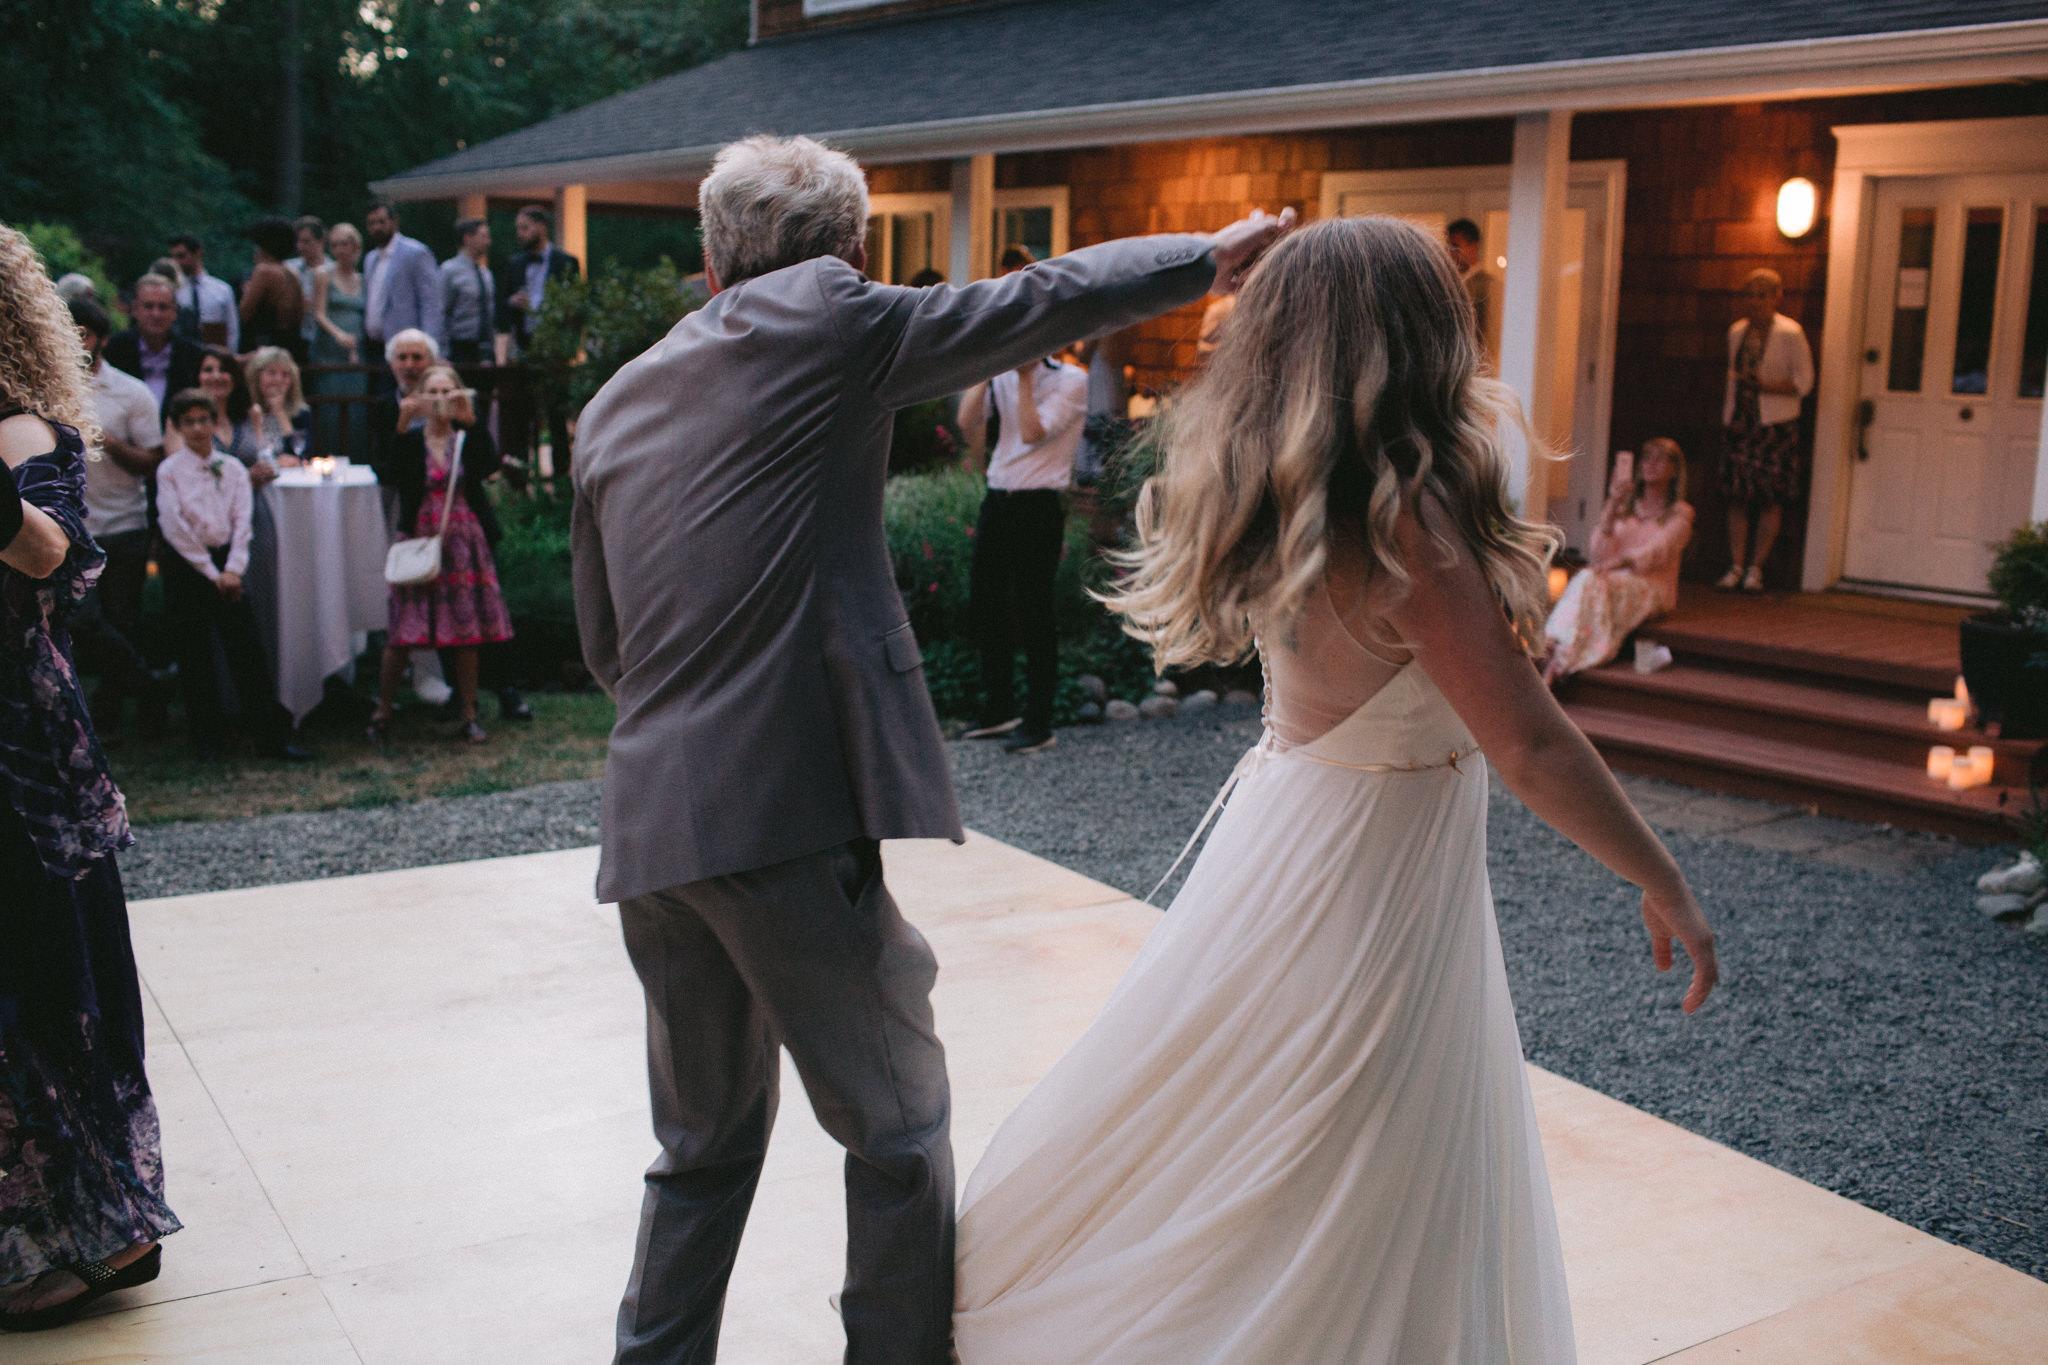 Backyard-Bainbridge-Island-Wedding-Alycia-Lovell-Photography-233.JPG